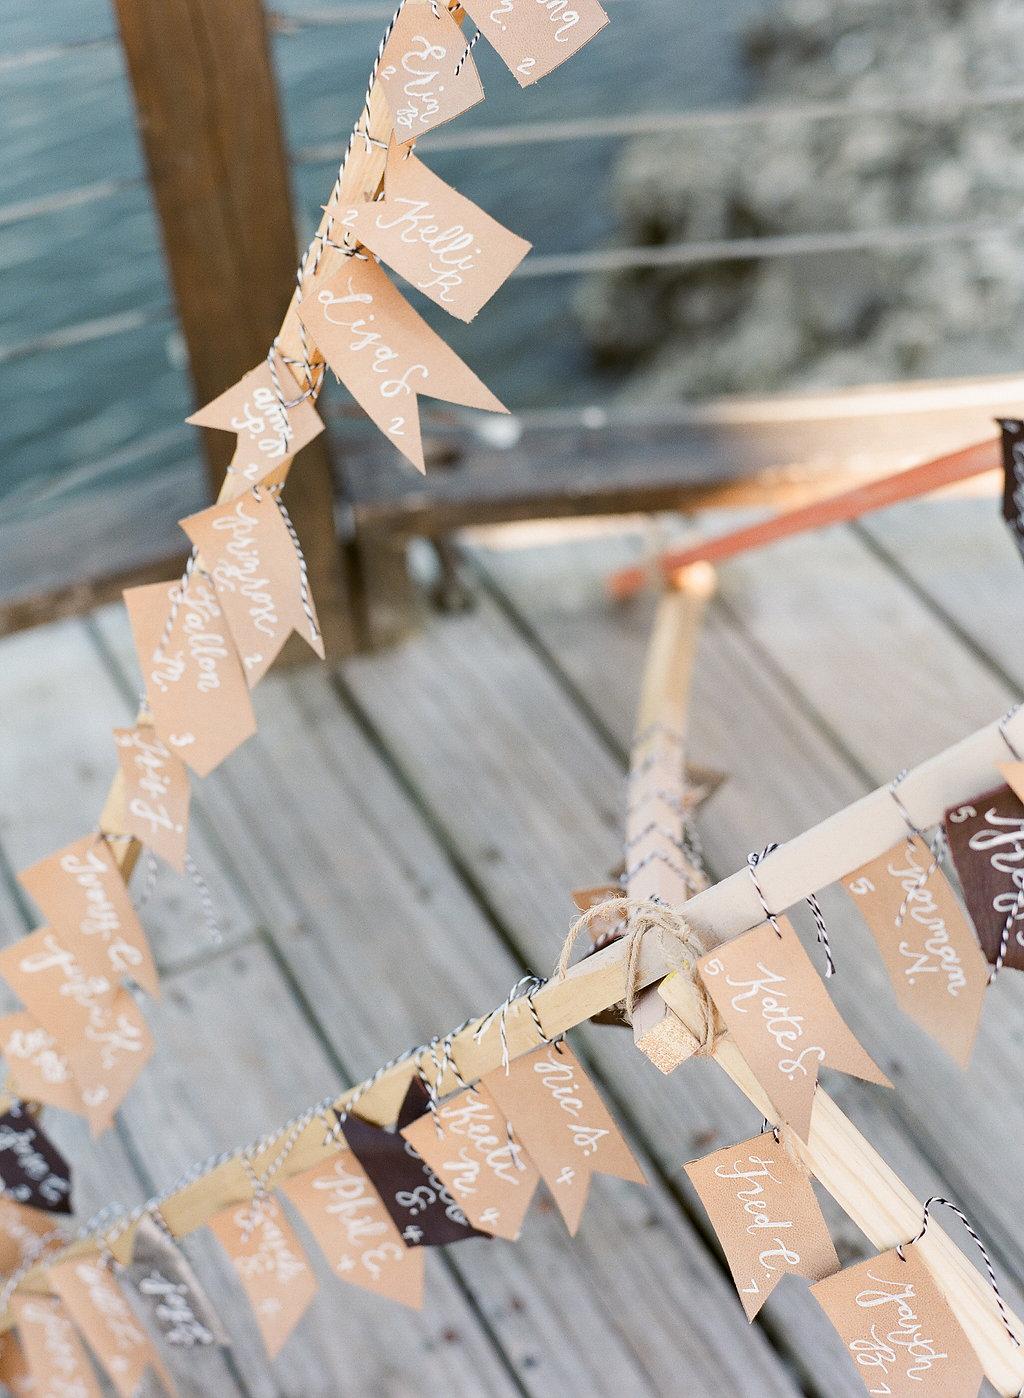 the-wyld-dock-bar-wedding-inspiration-leather-calligraphy-escort-cards.jpg